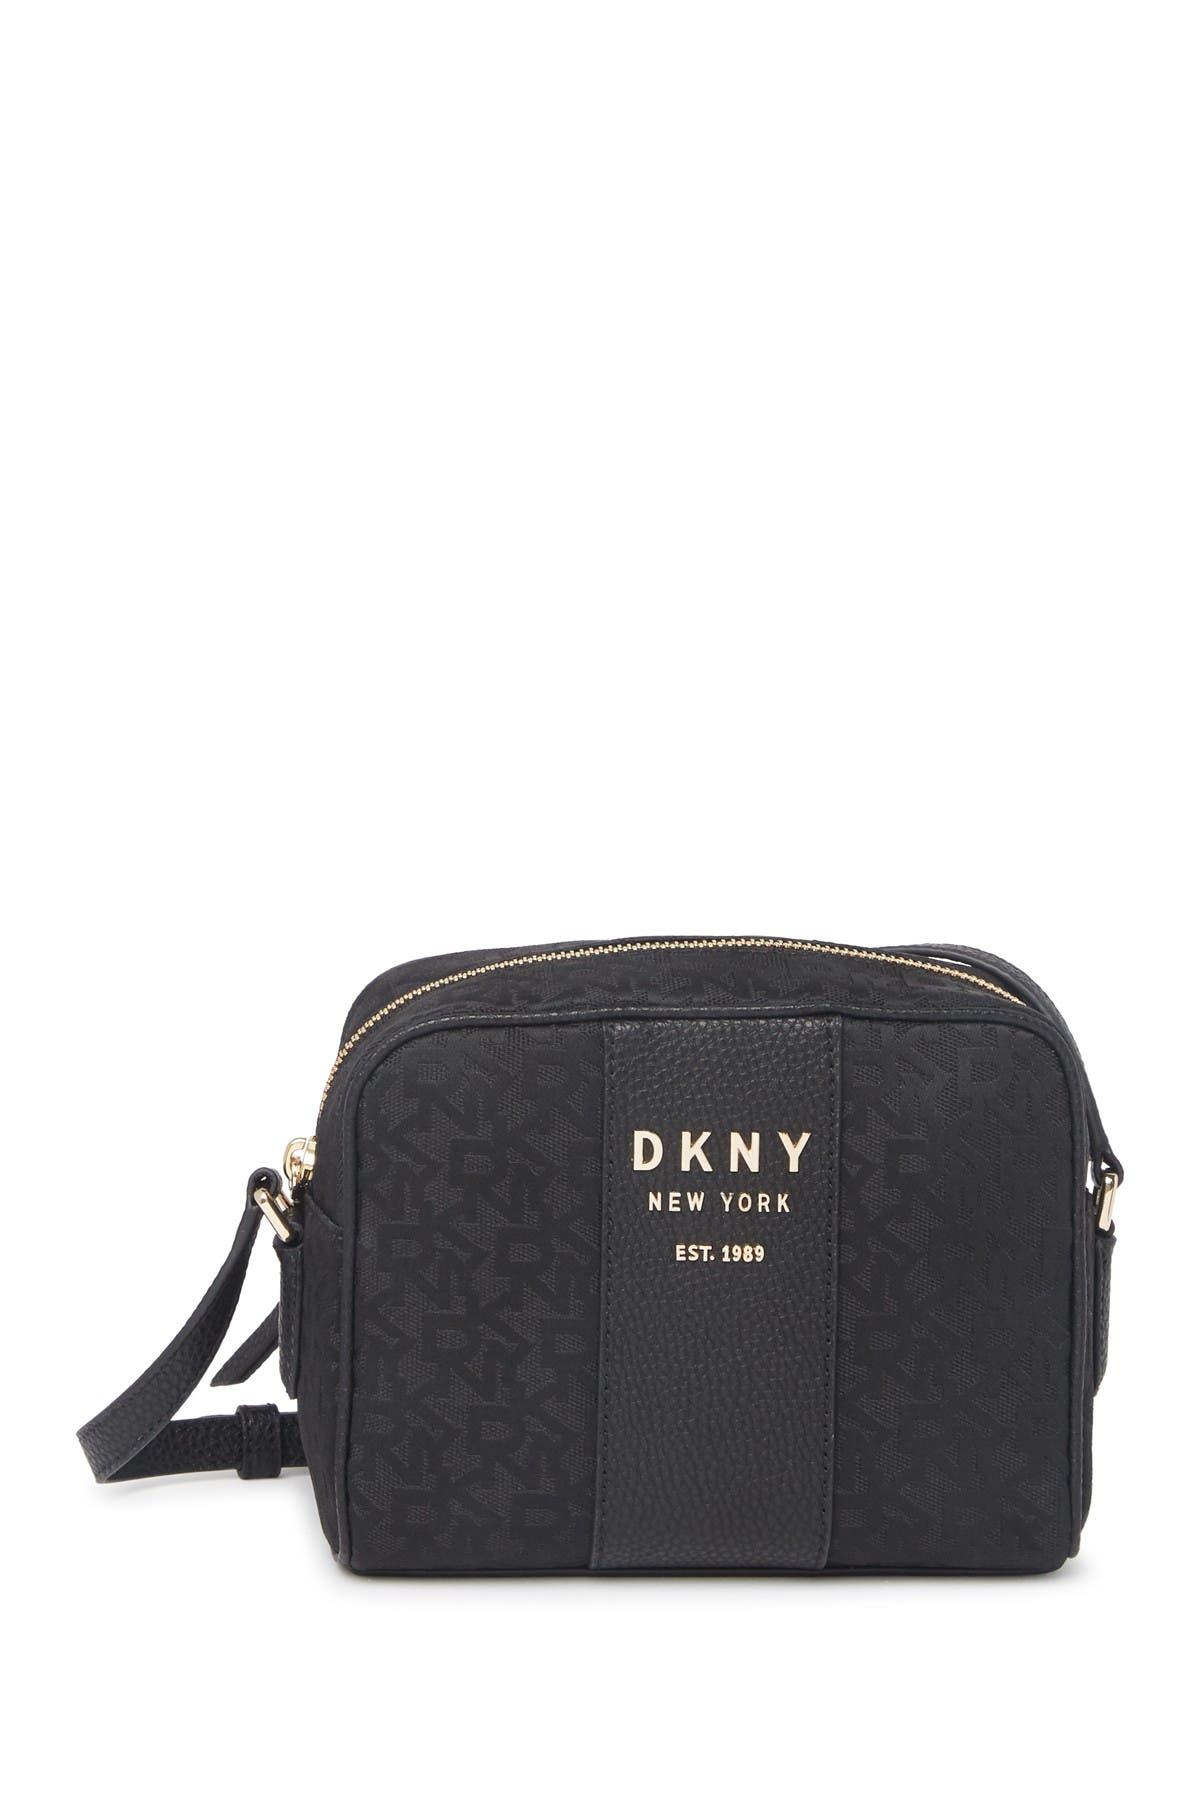 Image of DKNY Noho Leather Trim Camera Bag